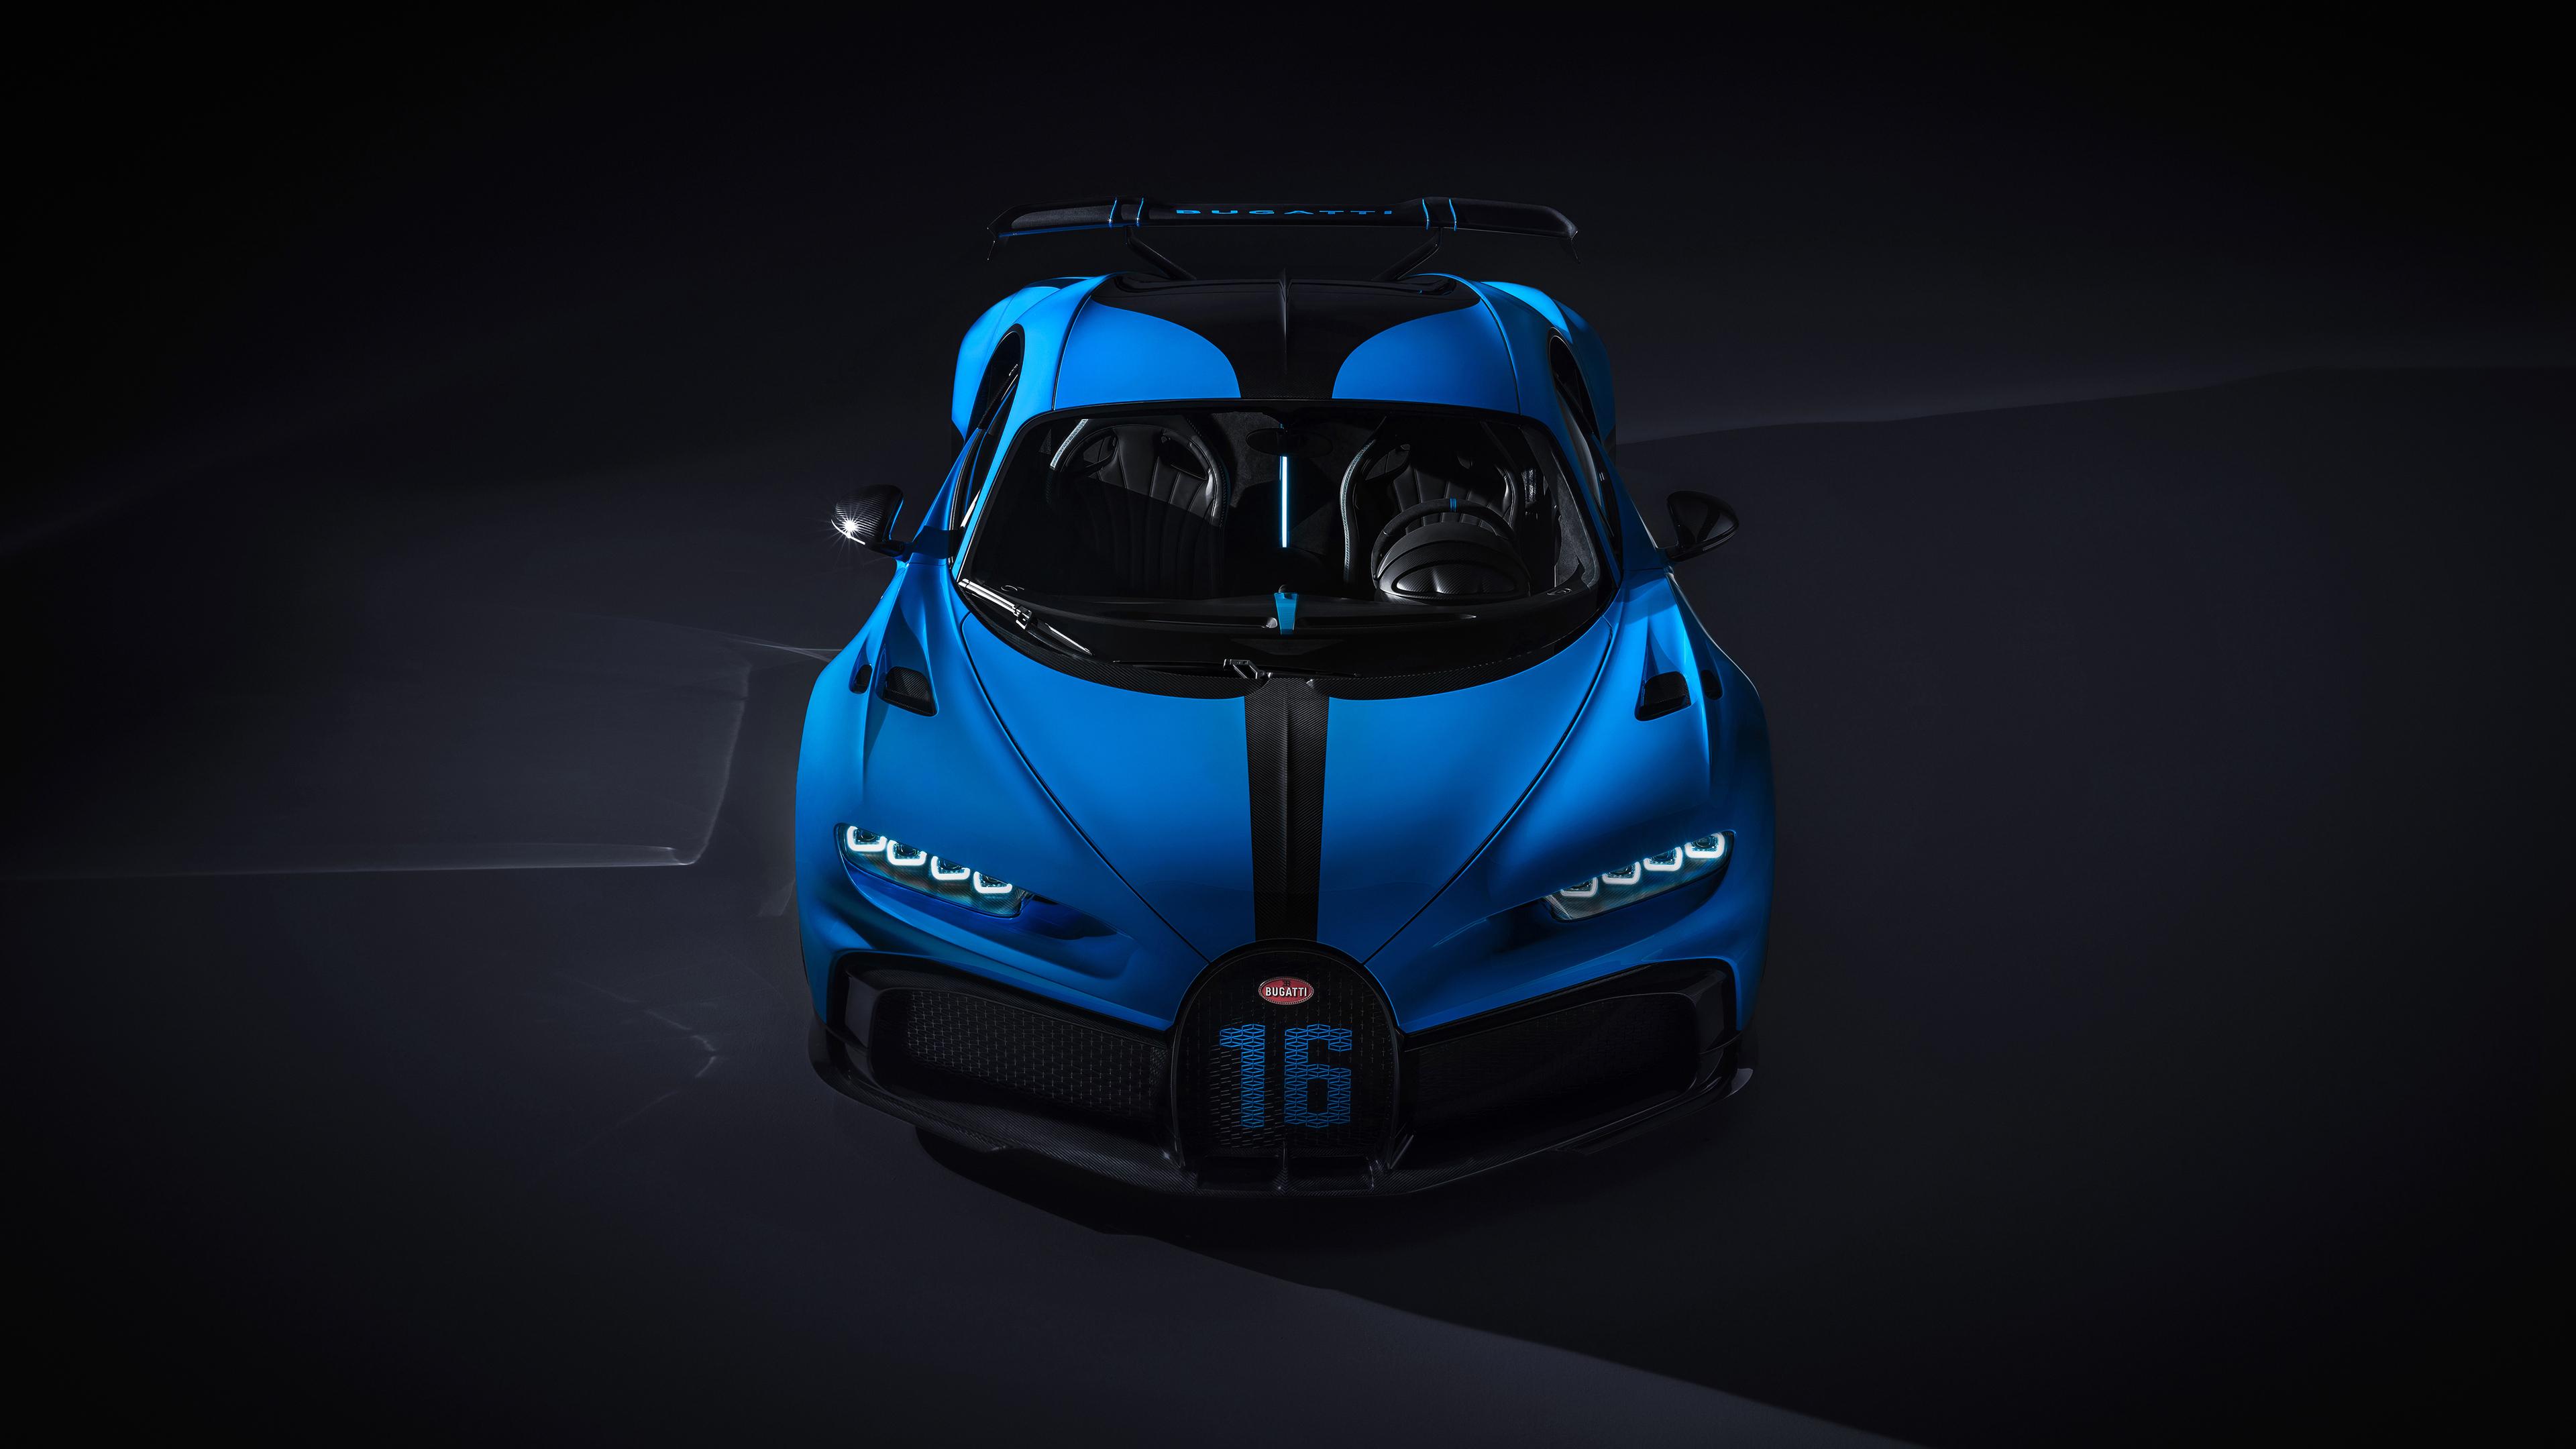 2020-bugatti-chiron-pur-sport-z9.jpg